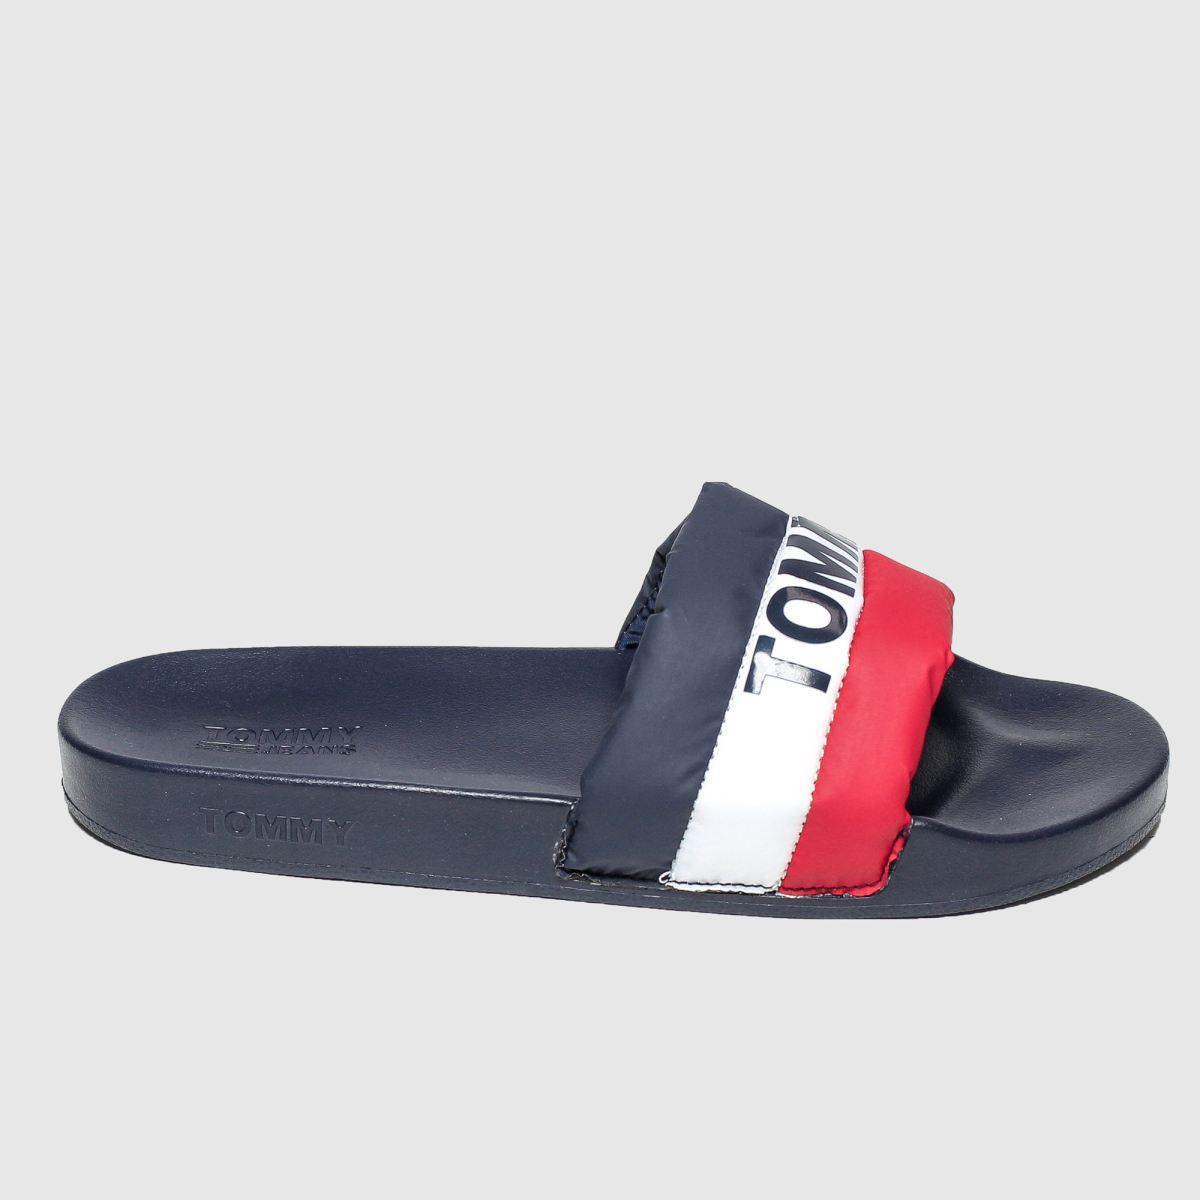 Tommy Hilfiger Navy Tj Padded Nylon Pool Slide Sandals